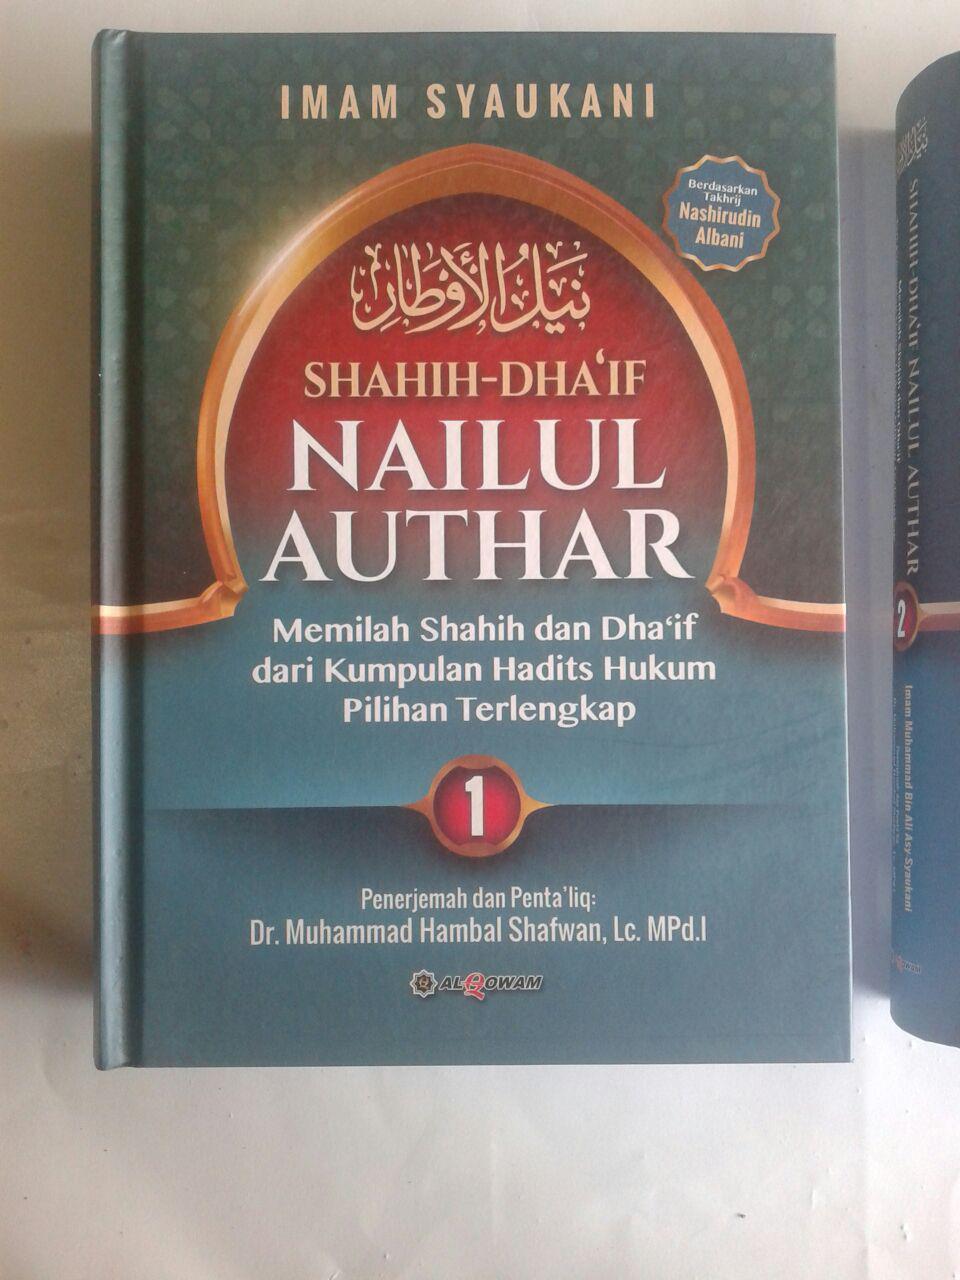 Buku Shahih Dhaif Nailul Authar Kumpulan Hadits Hukum Terlengkap cover